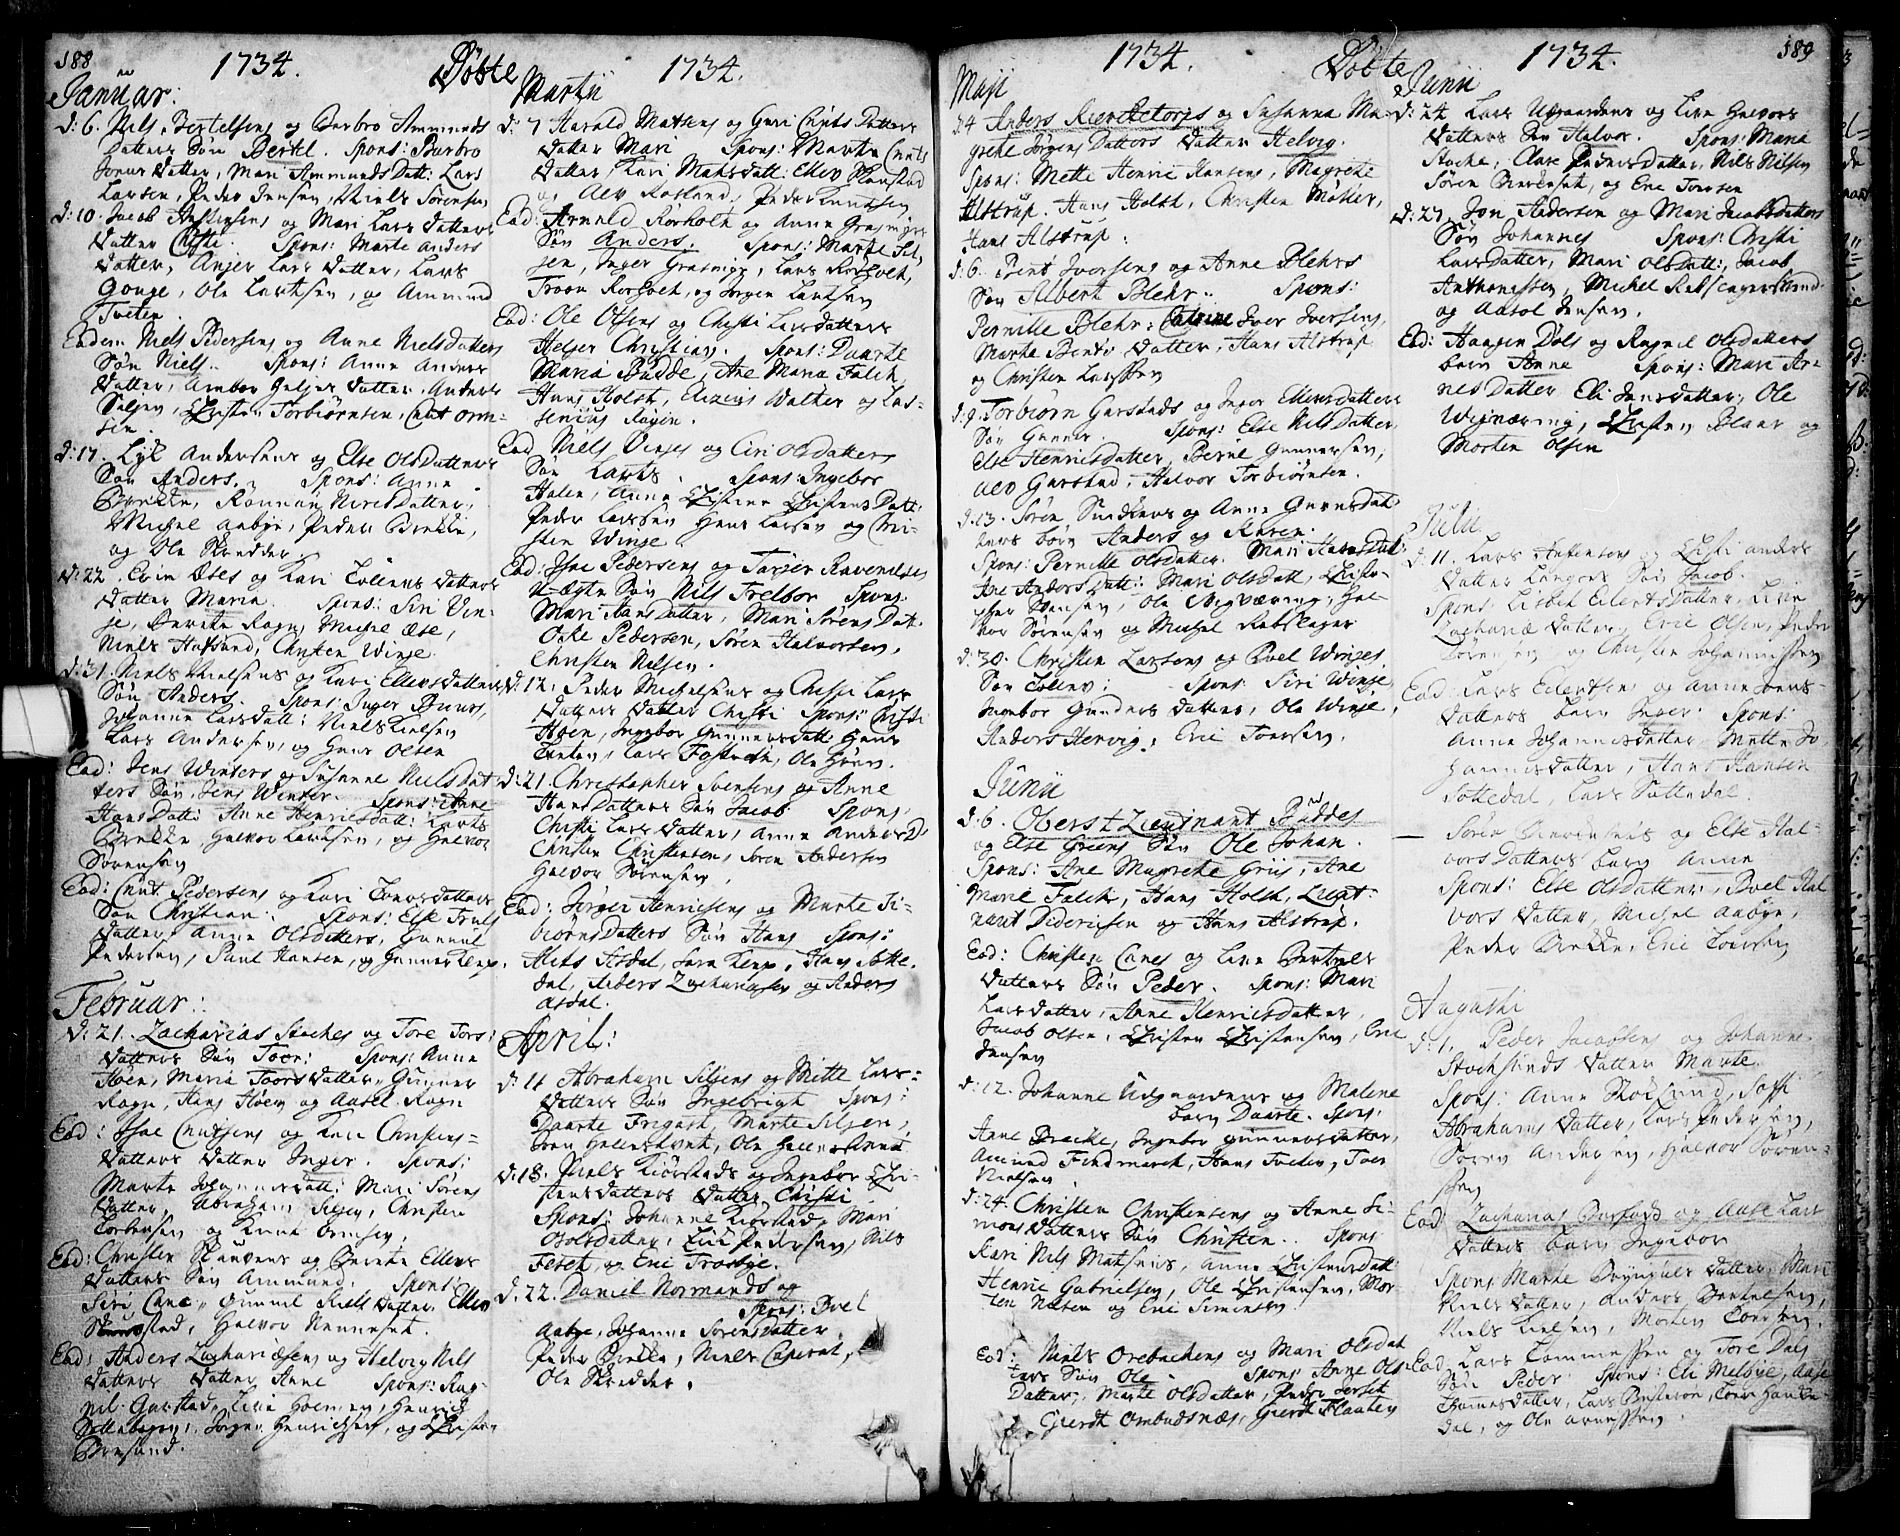 SAKO, Bamble kirkebøker, F/Fa/L0001: Ministerialbok nr. I 1, 1702-1774, s. 188-189